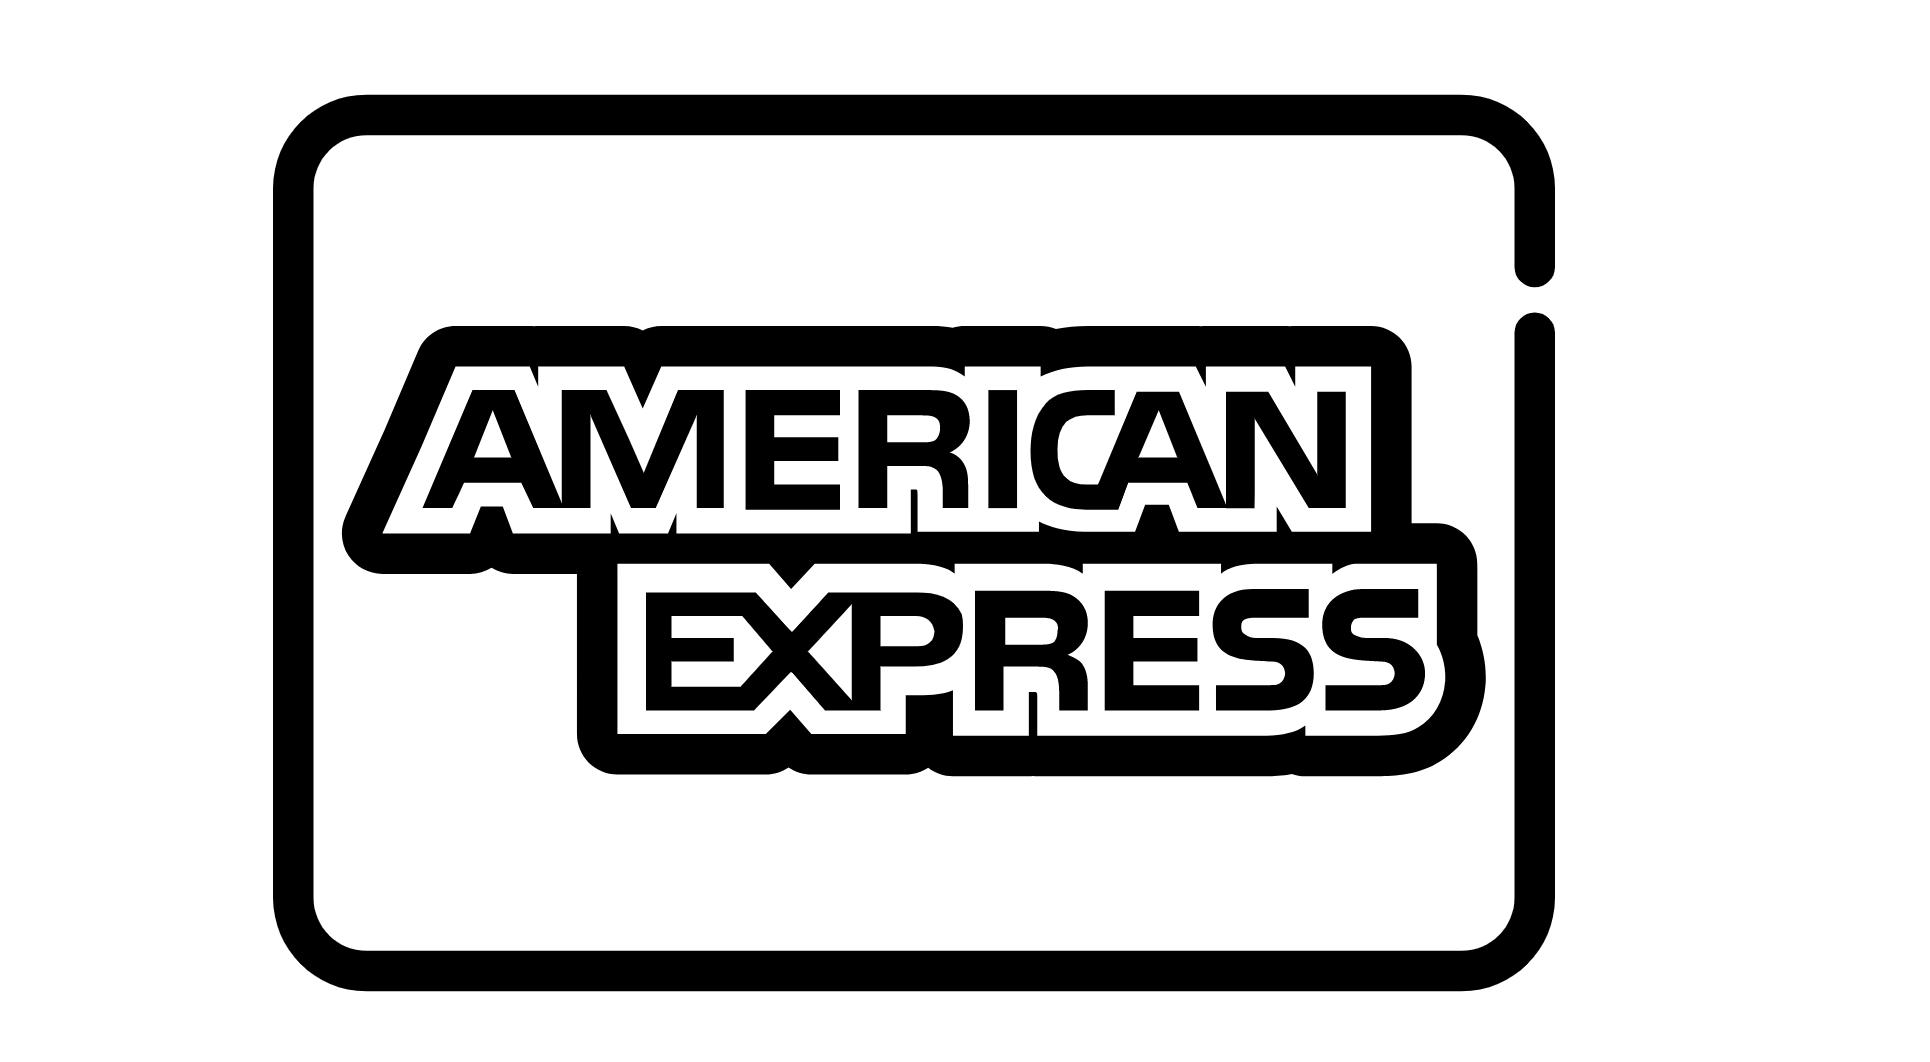 www.americanexpress.com/createaccount